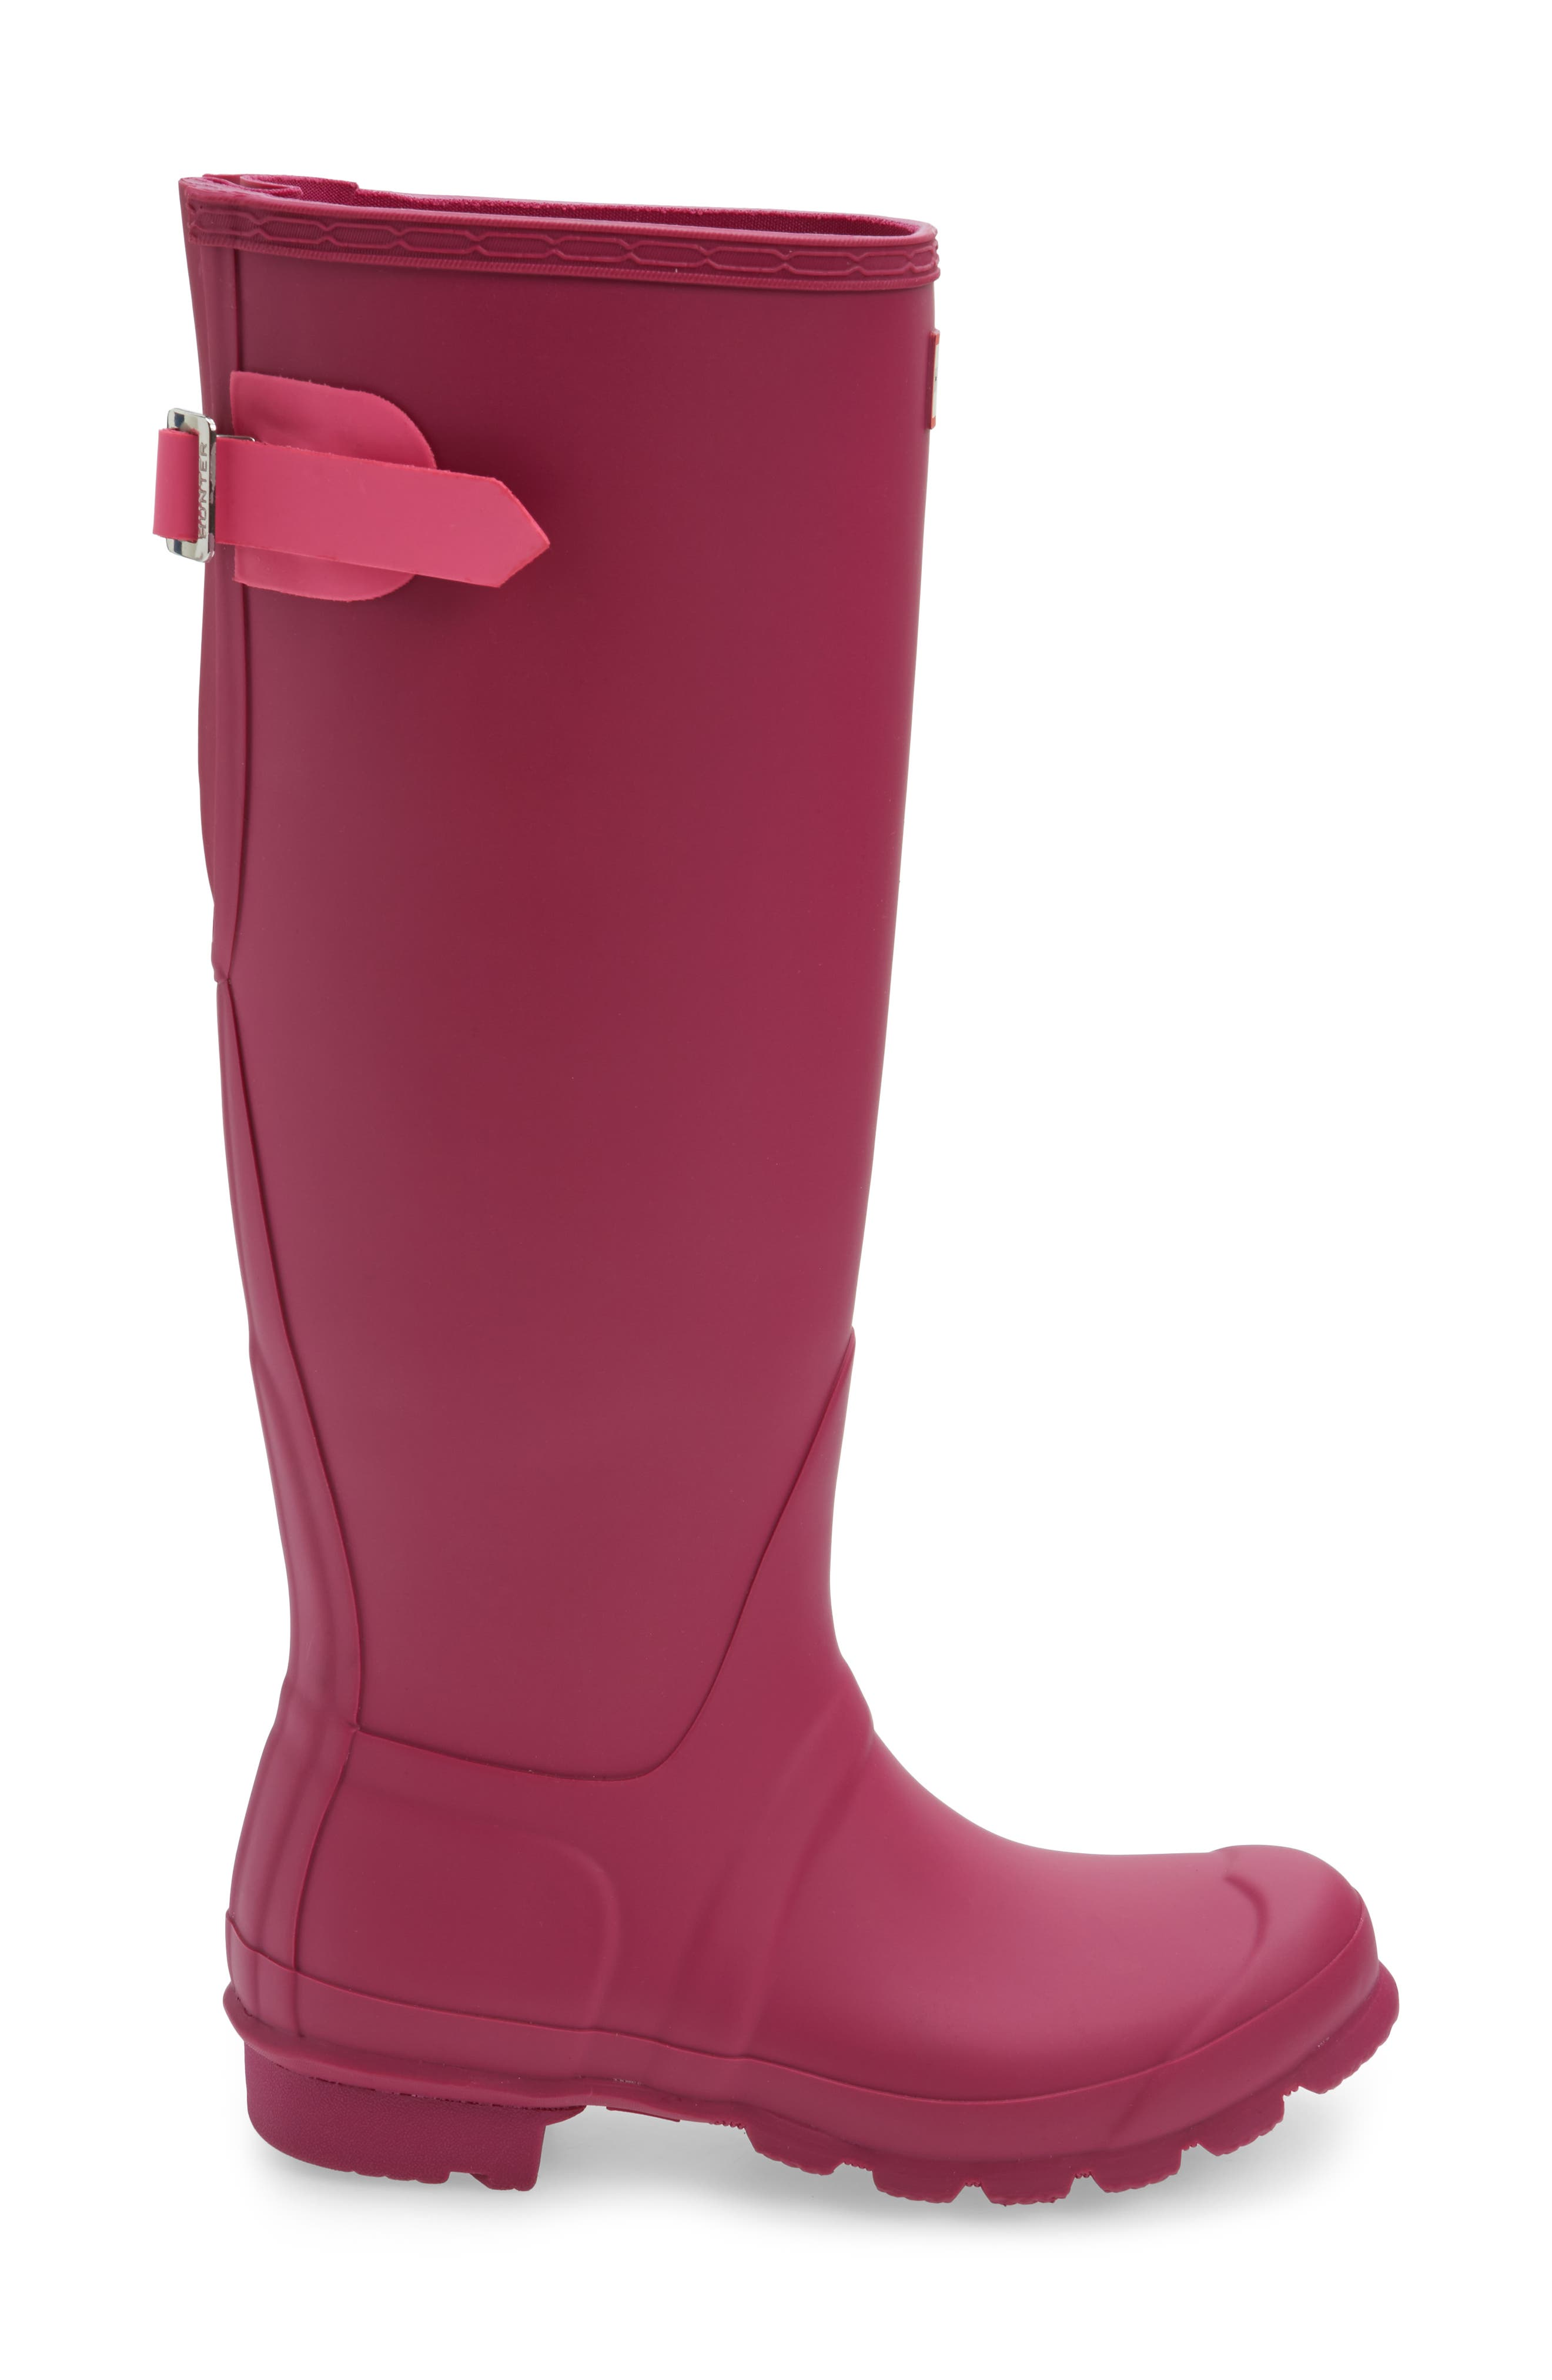 Adjustable Calf Rain Boot,                             Alternate thumbnail 3, color,                             Dark Ion Pink/ Ion Pink